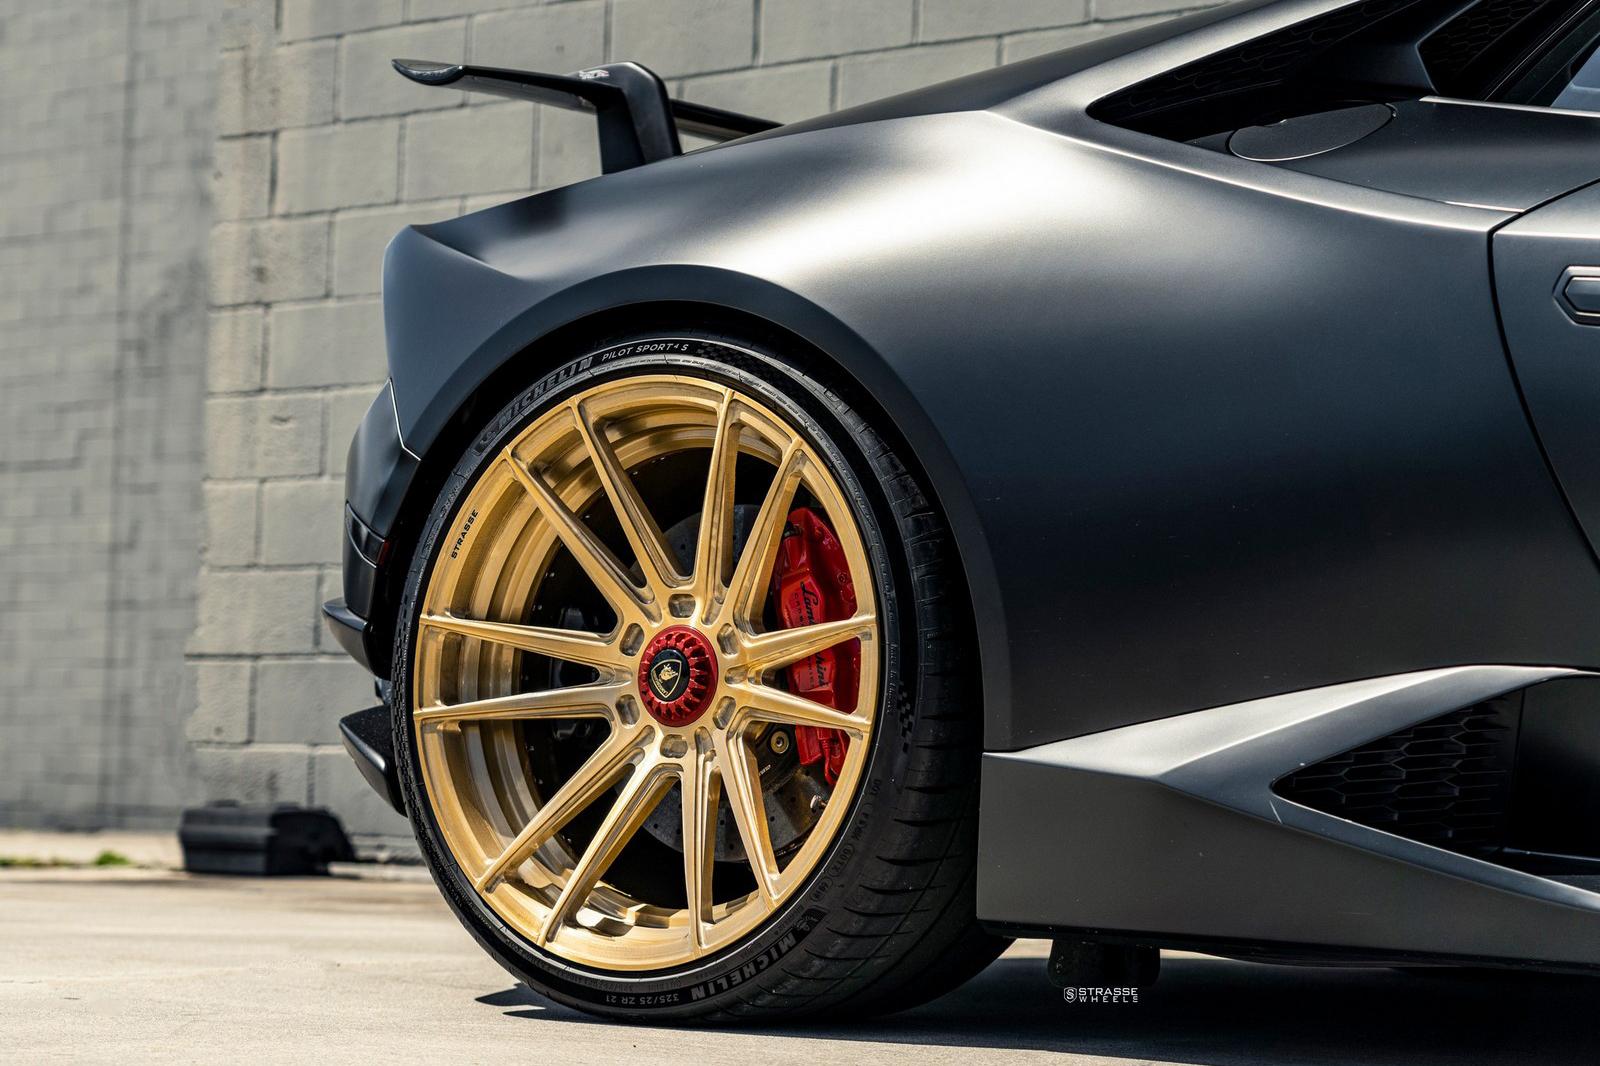 Introduzione di Rhodes da Lamborghini Hurason